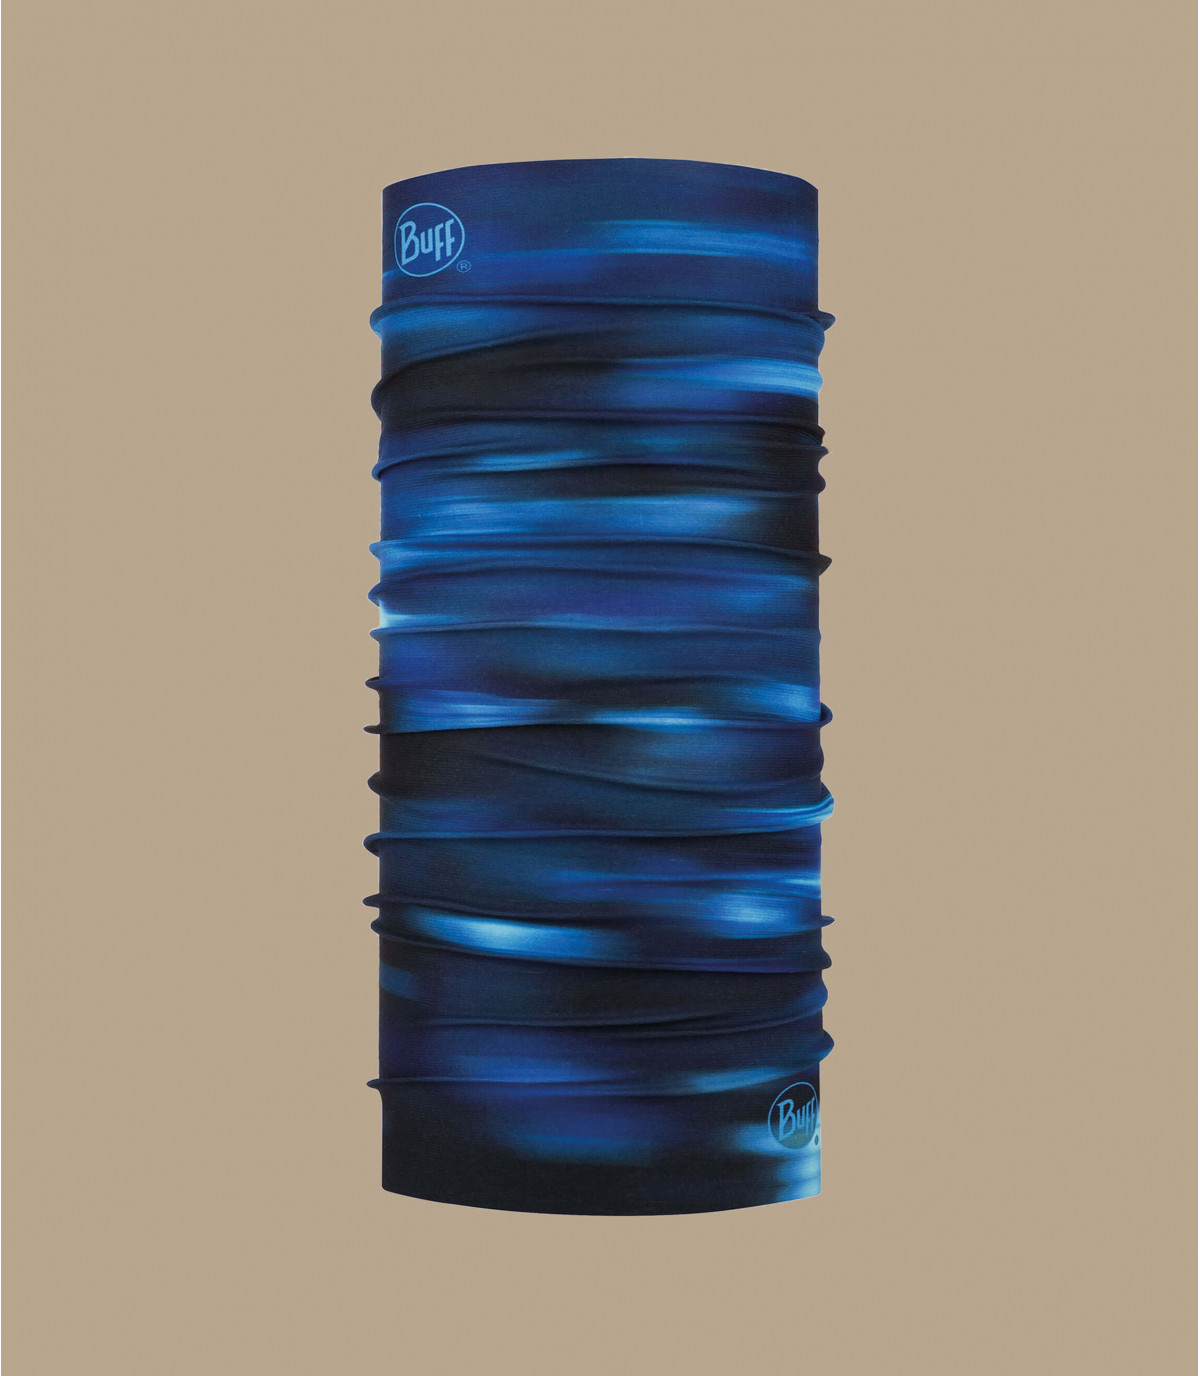 Buff bedruckt blau schwarz